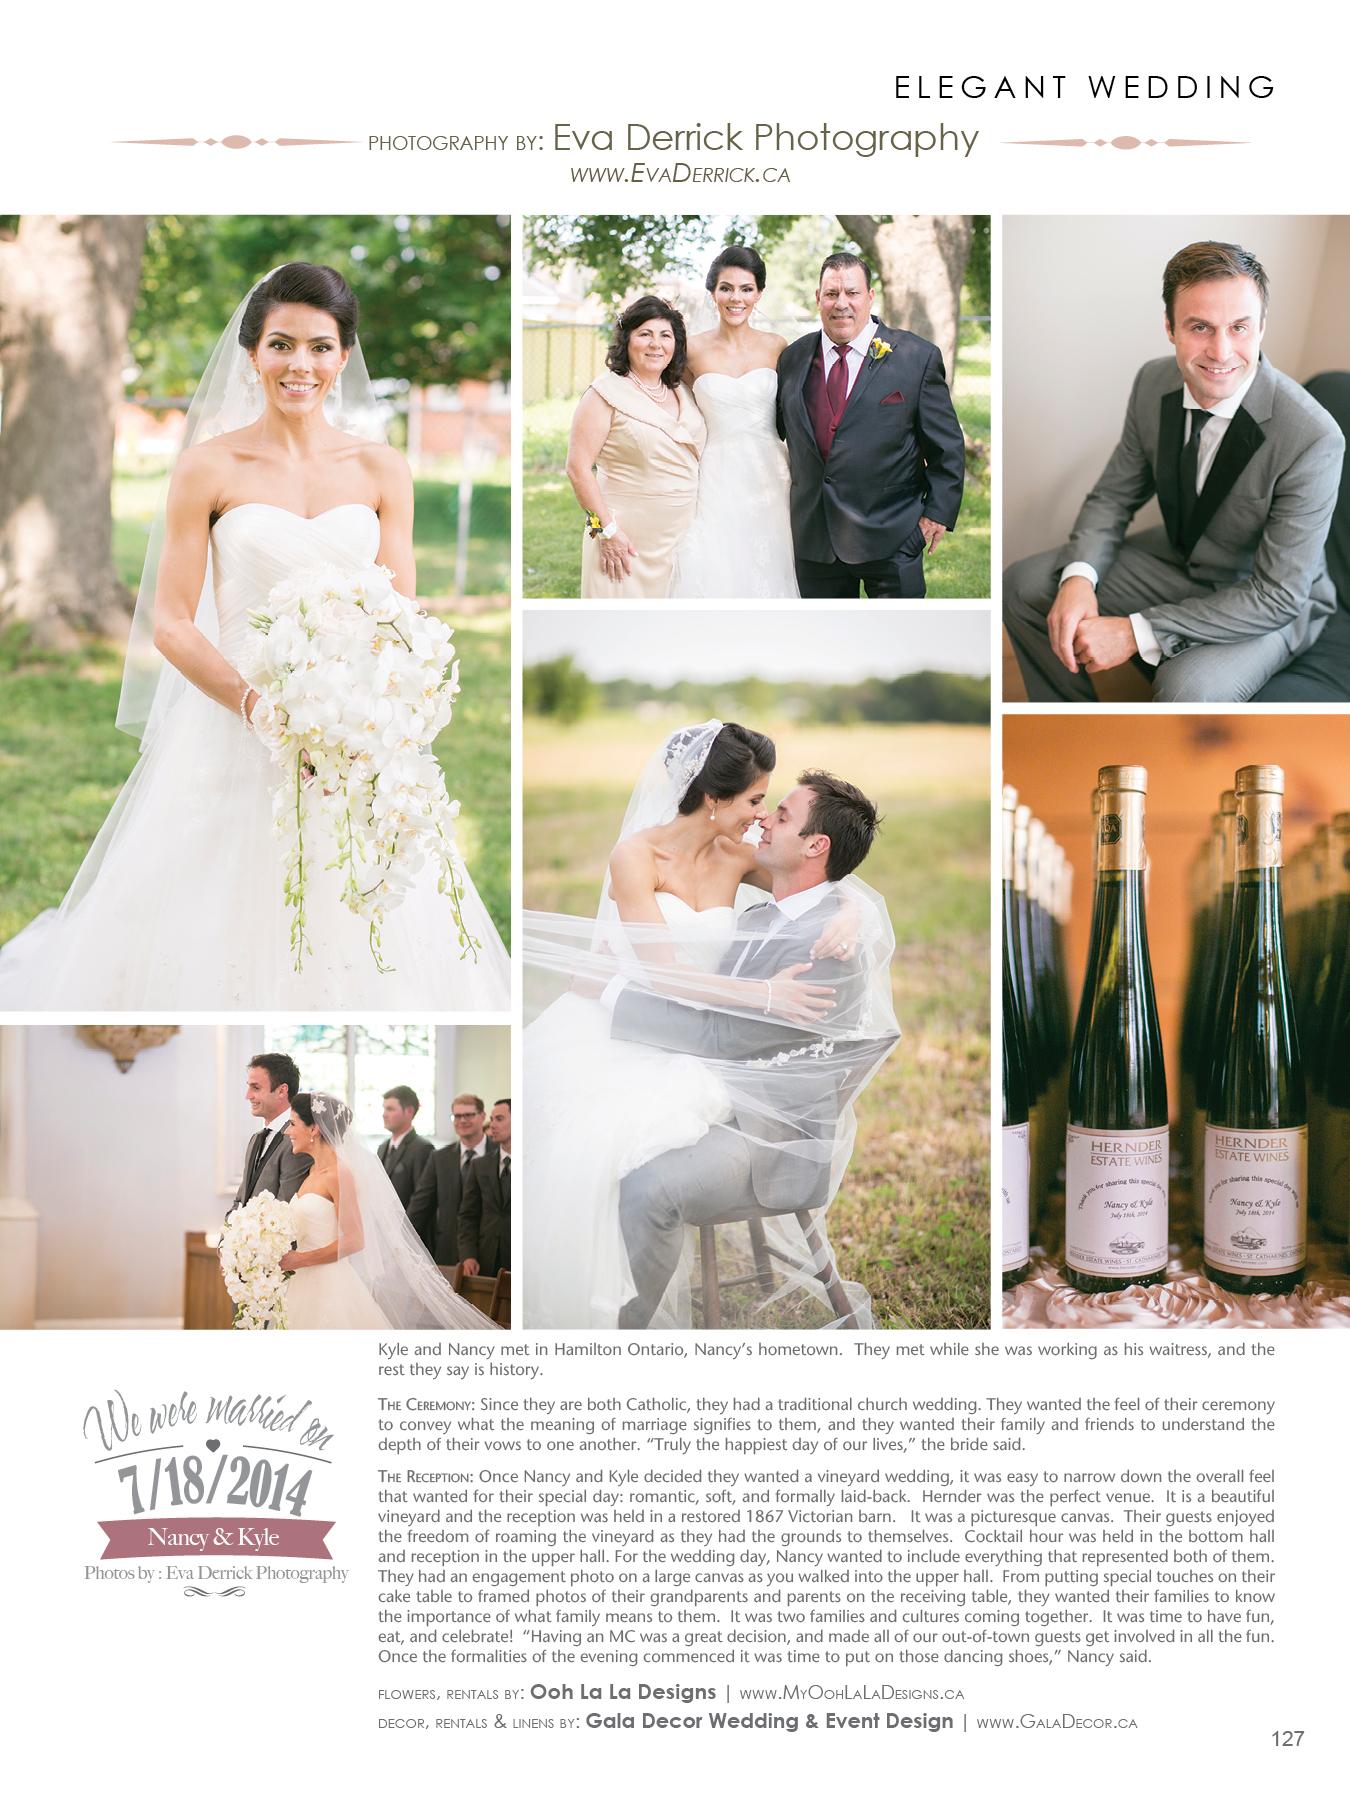 niagara-wedding-photographer-niagara-region-niagara-weddings-elegant-wedding-magazine-feature-nancy-kyle-chipchura-phoenix-coyotes-eva-derrick-photography-hernder-estate-wines-winery-vineyard-wedding-barn-wedding-3.jpg